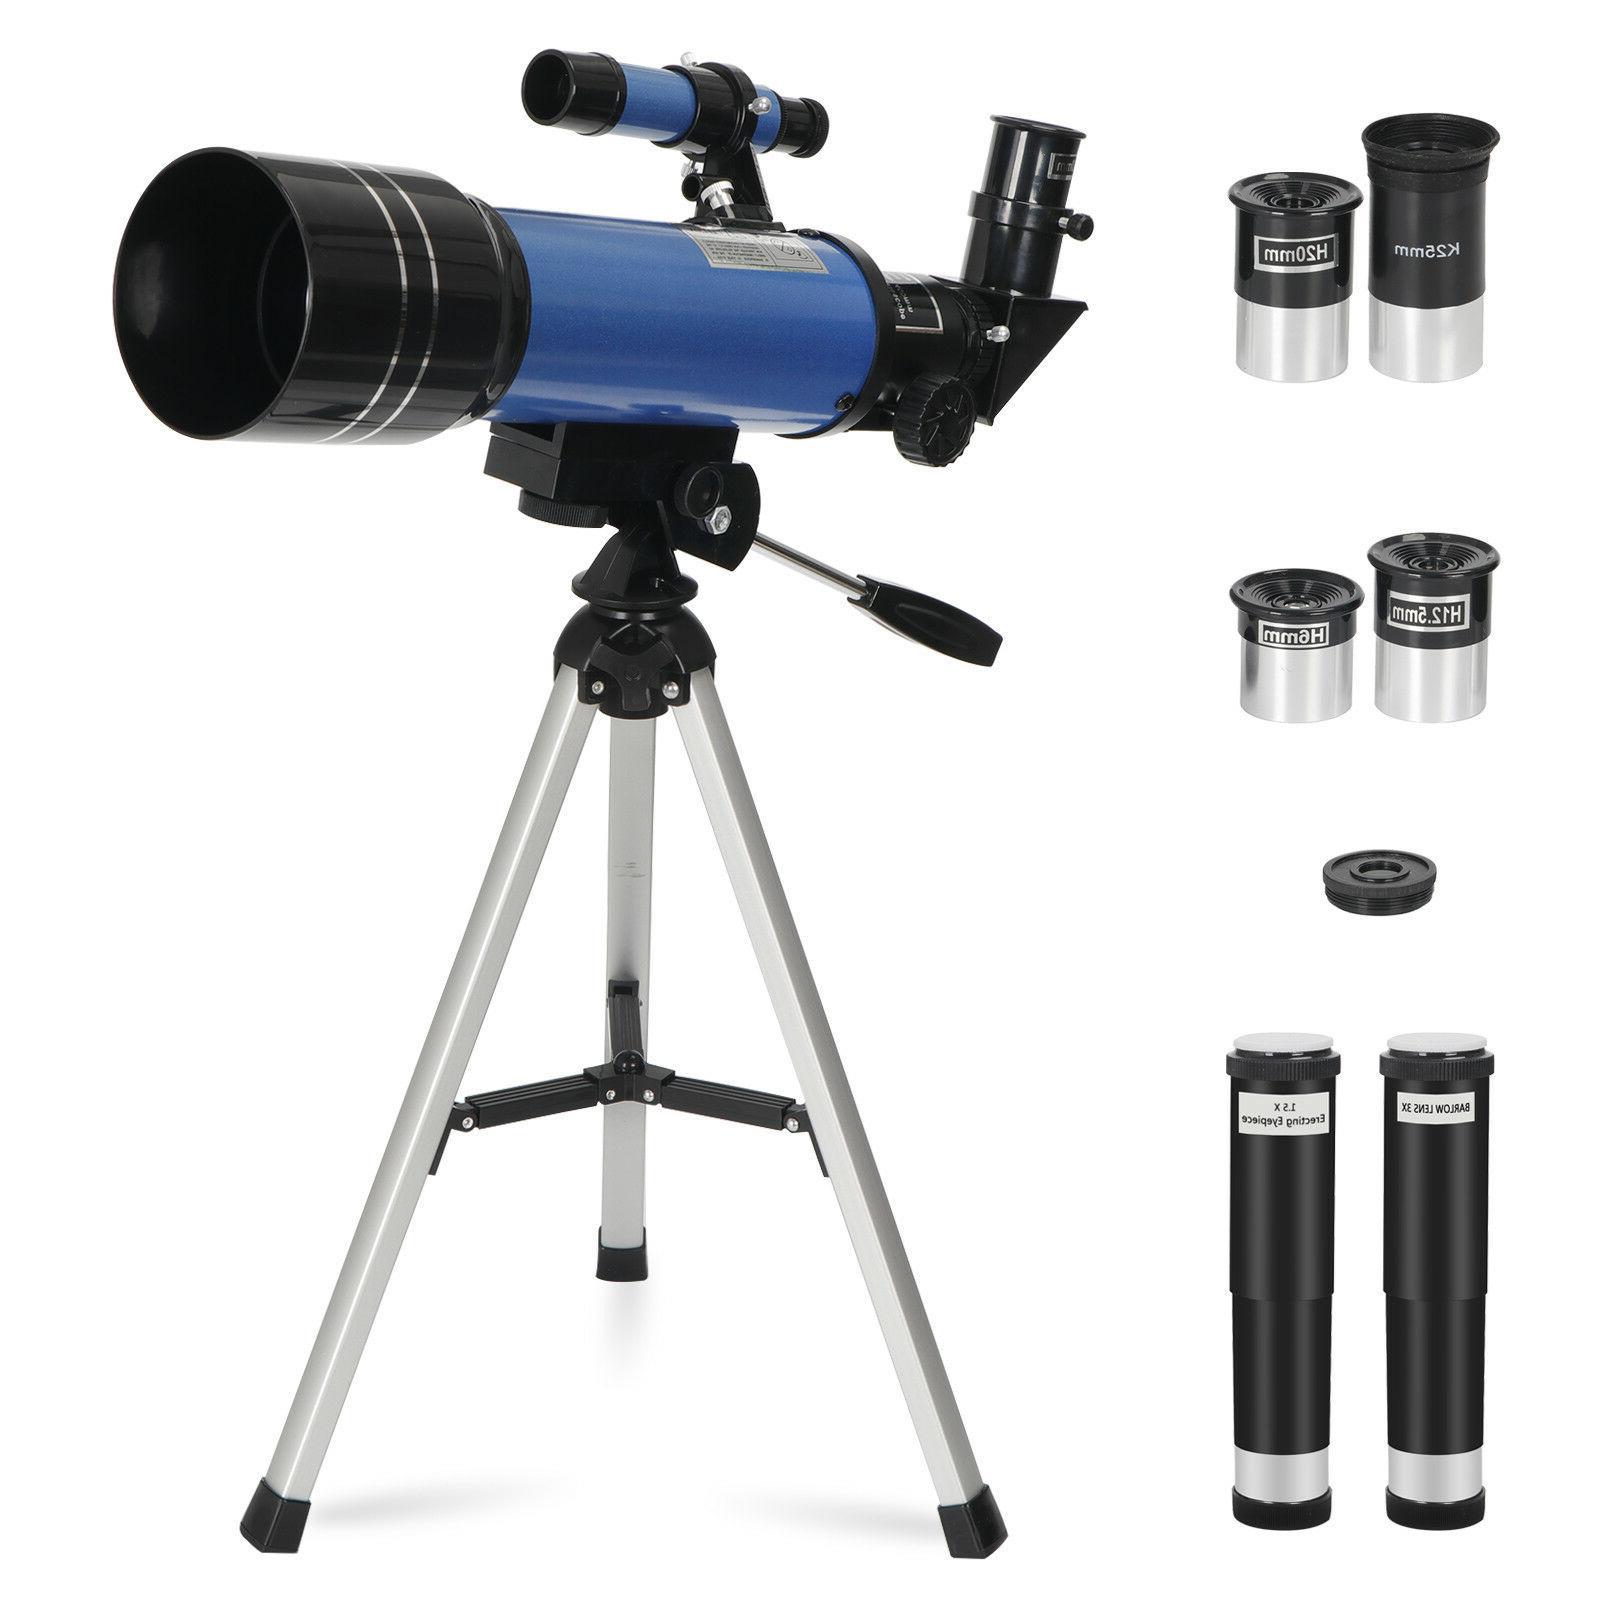 70mm Astronomical Telescope Scope Eyepieces